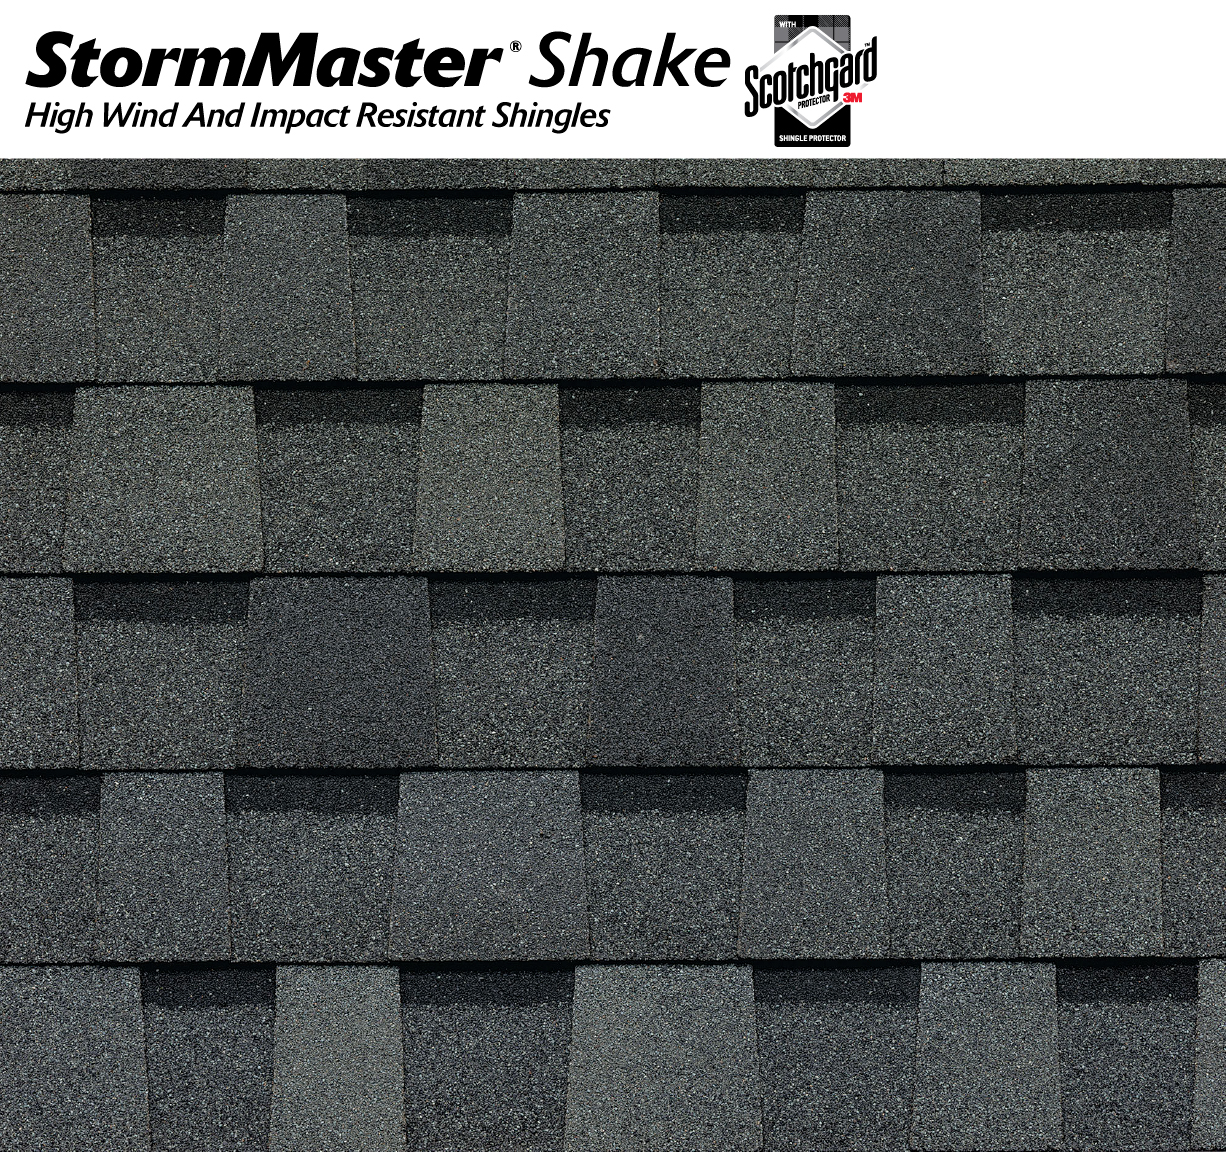 Atlas Stormmaster Shake Shingles E Esquivel Roofing